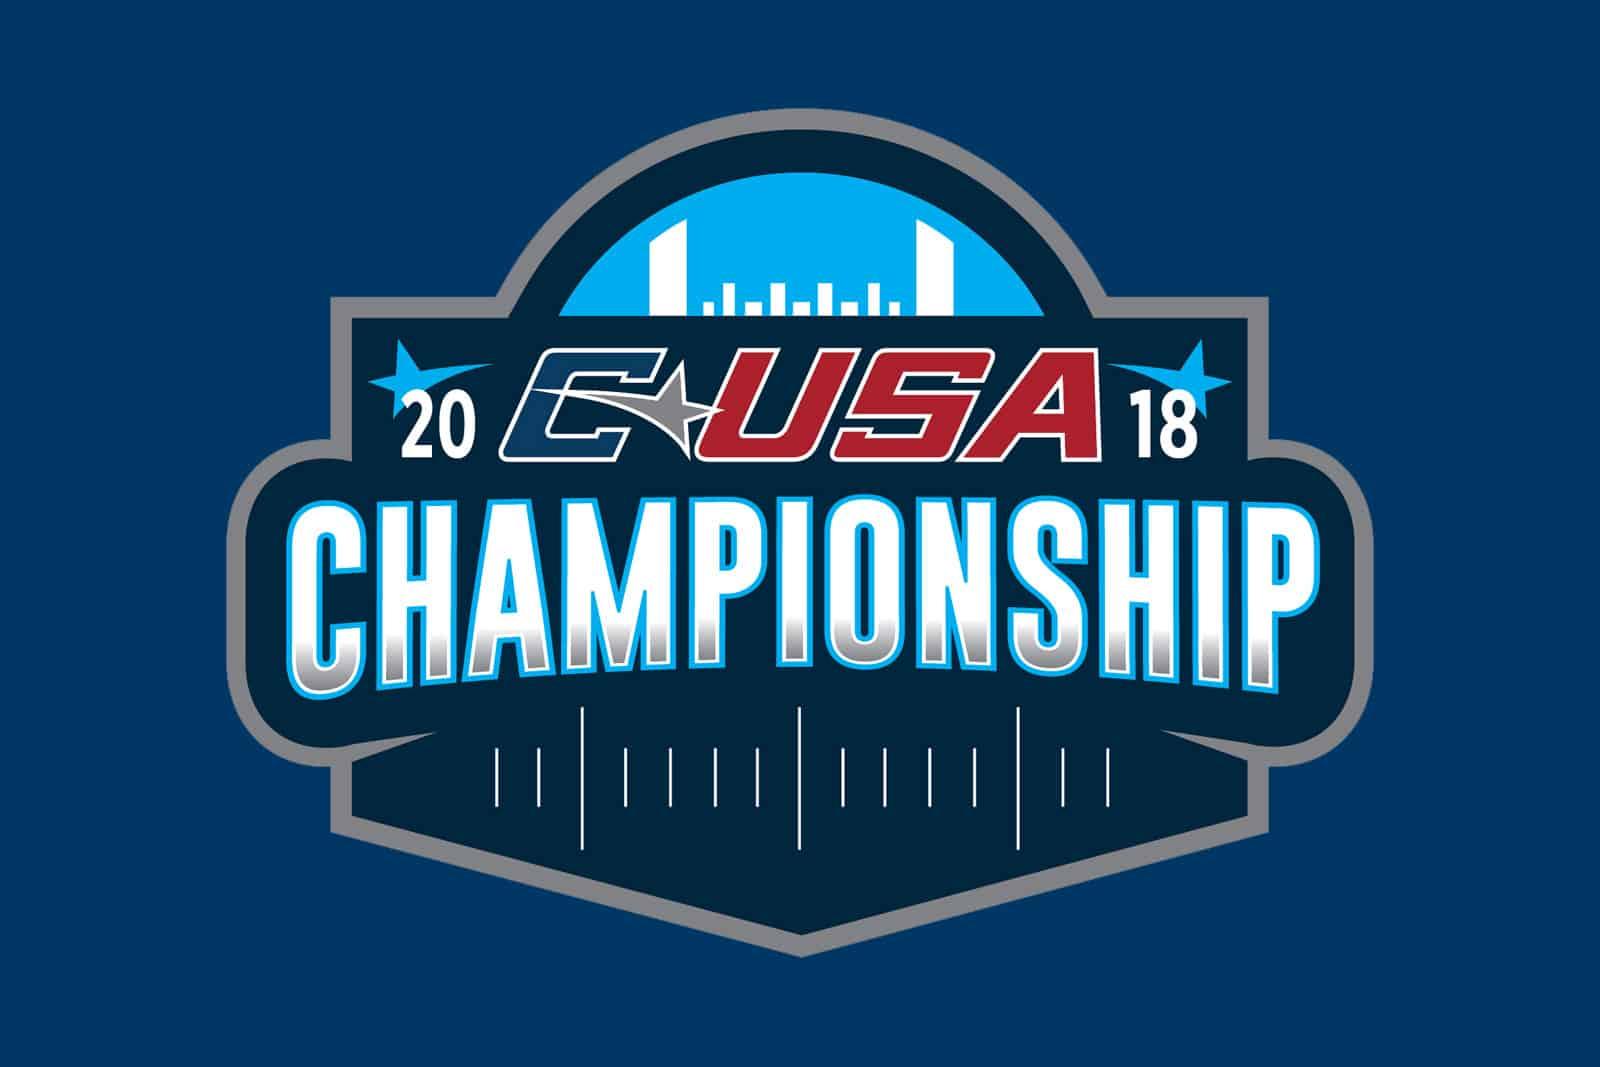 2018 Conference USA Championship Game